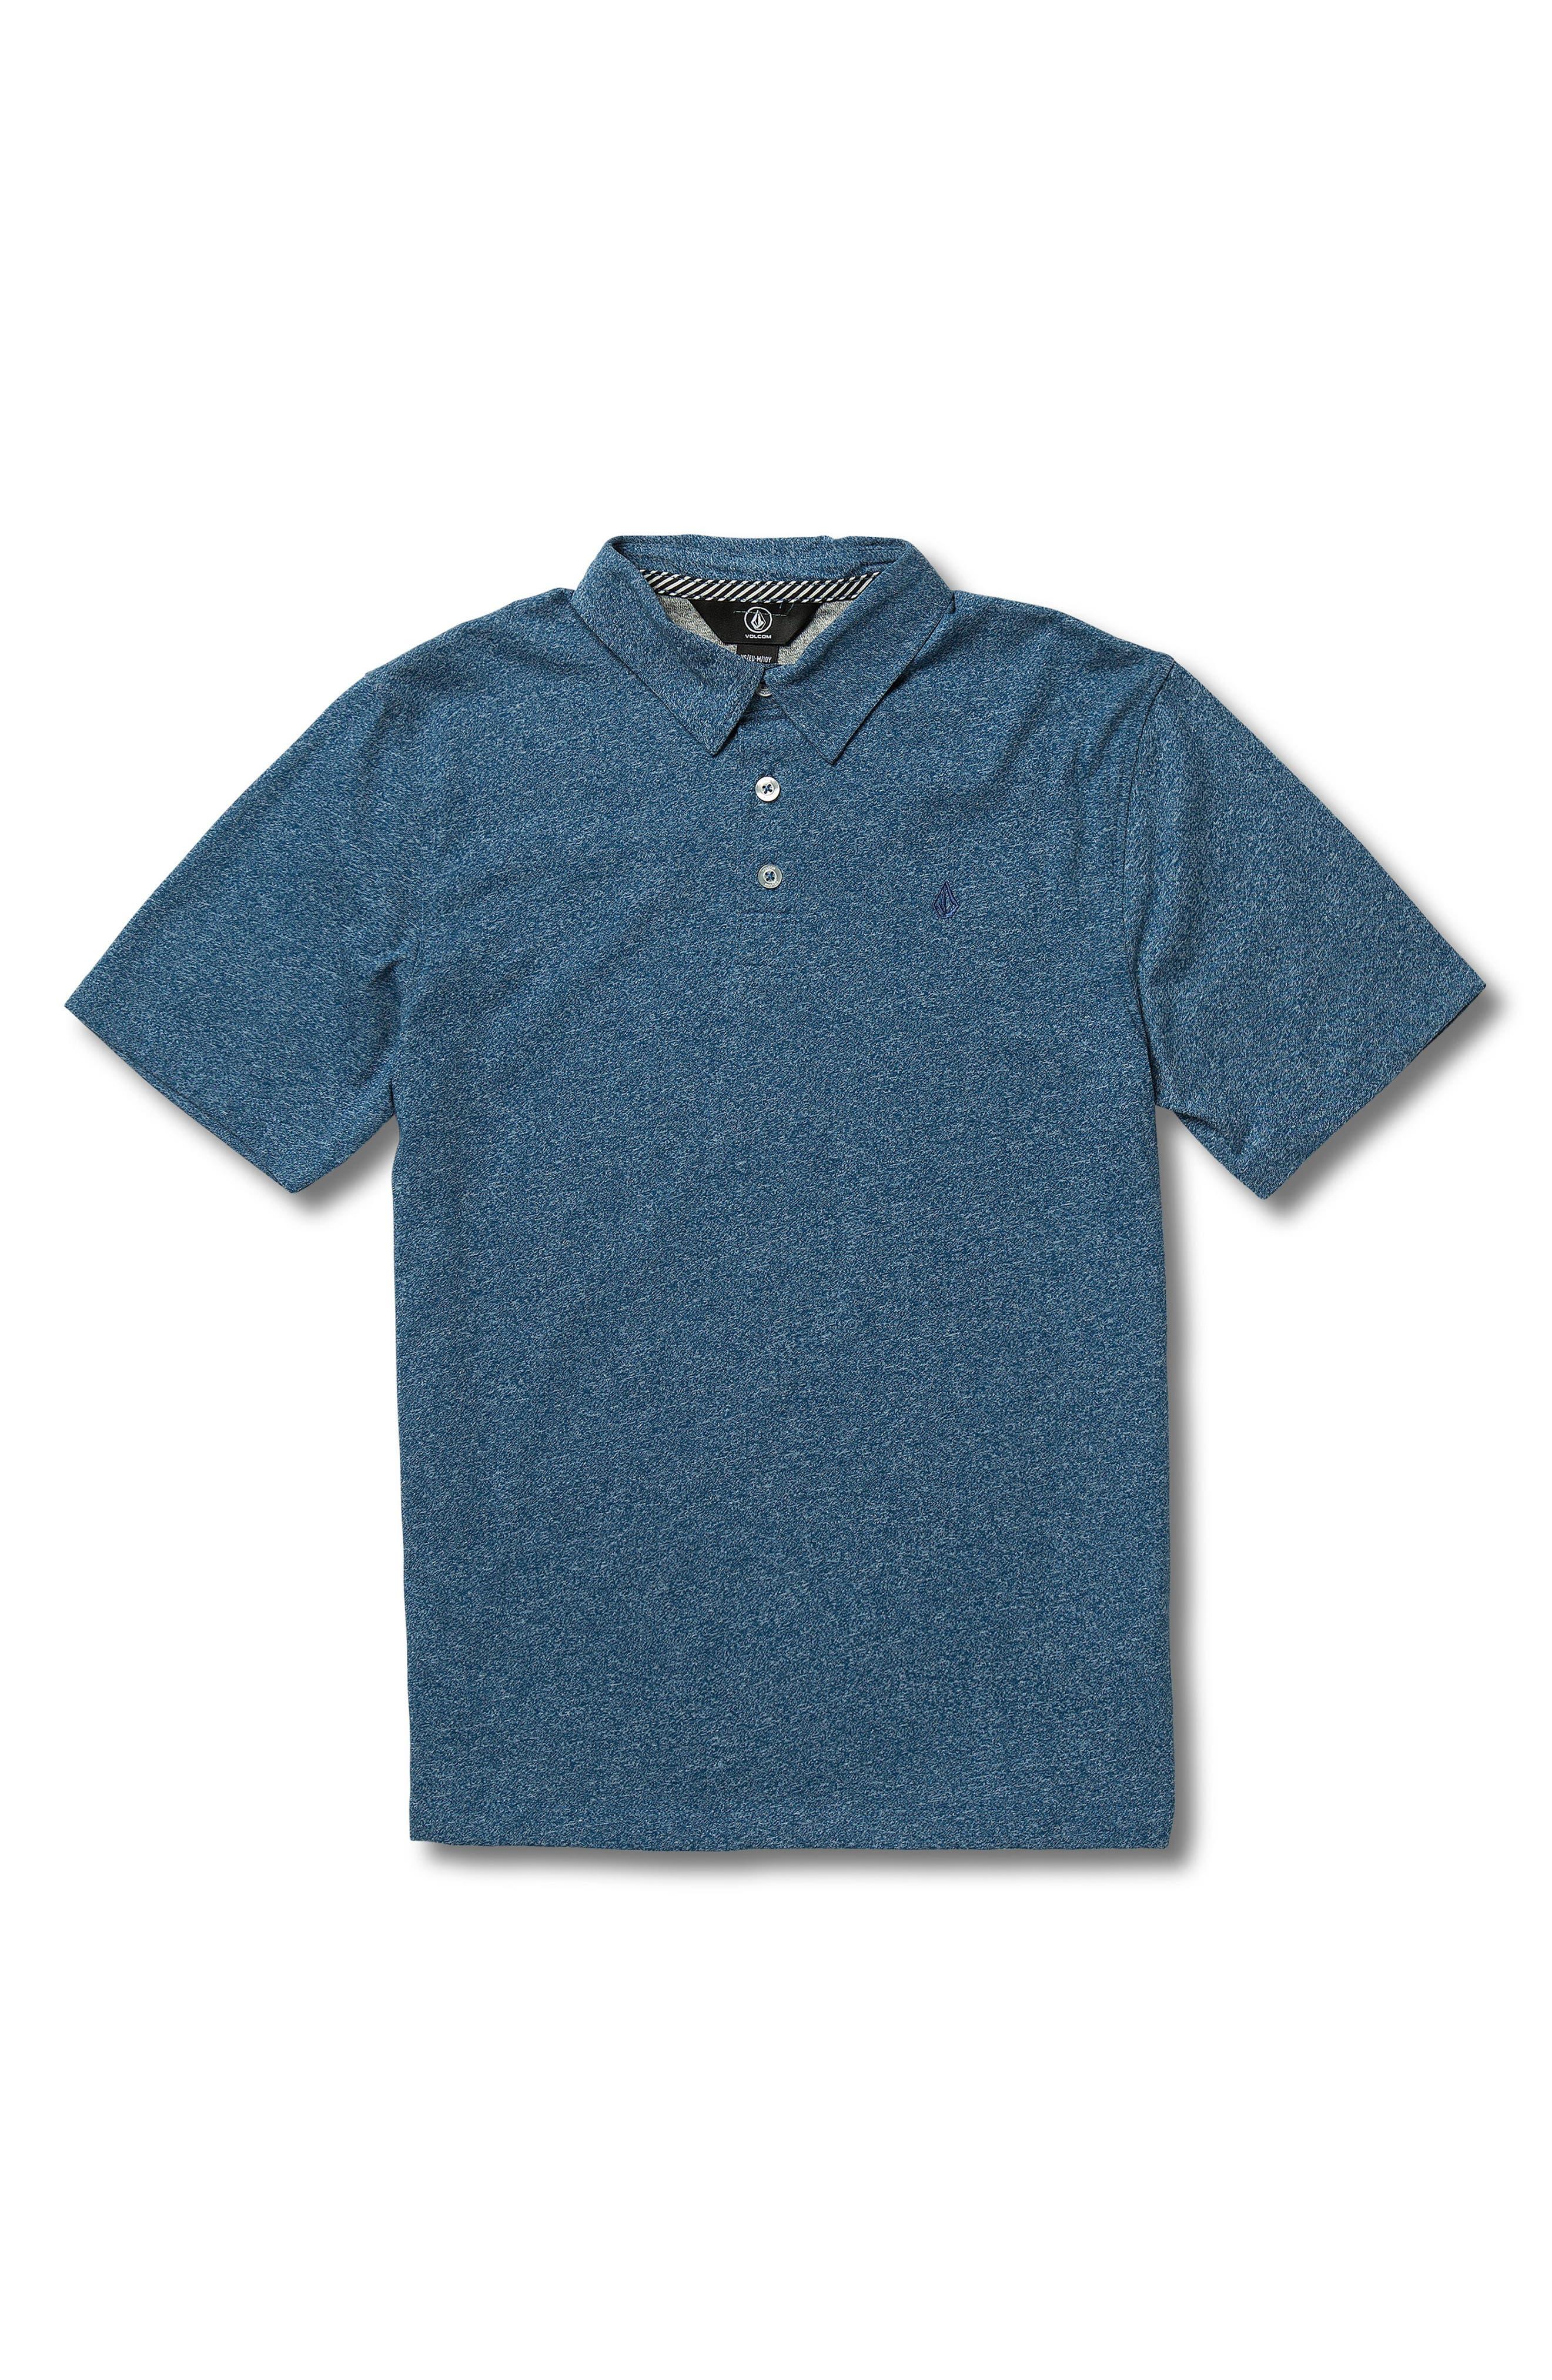 Wowzer Polo,                         Main,                         color, 466